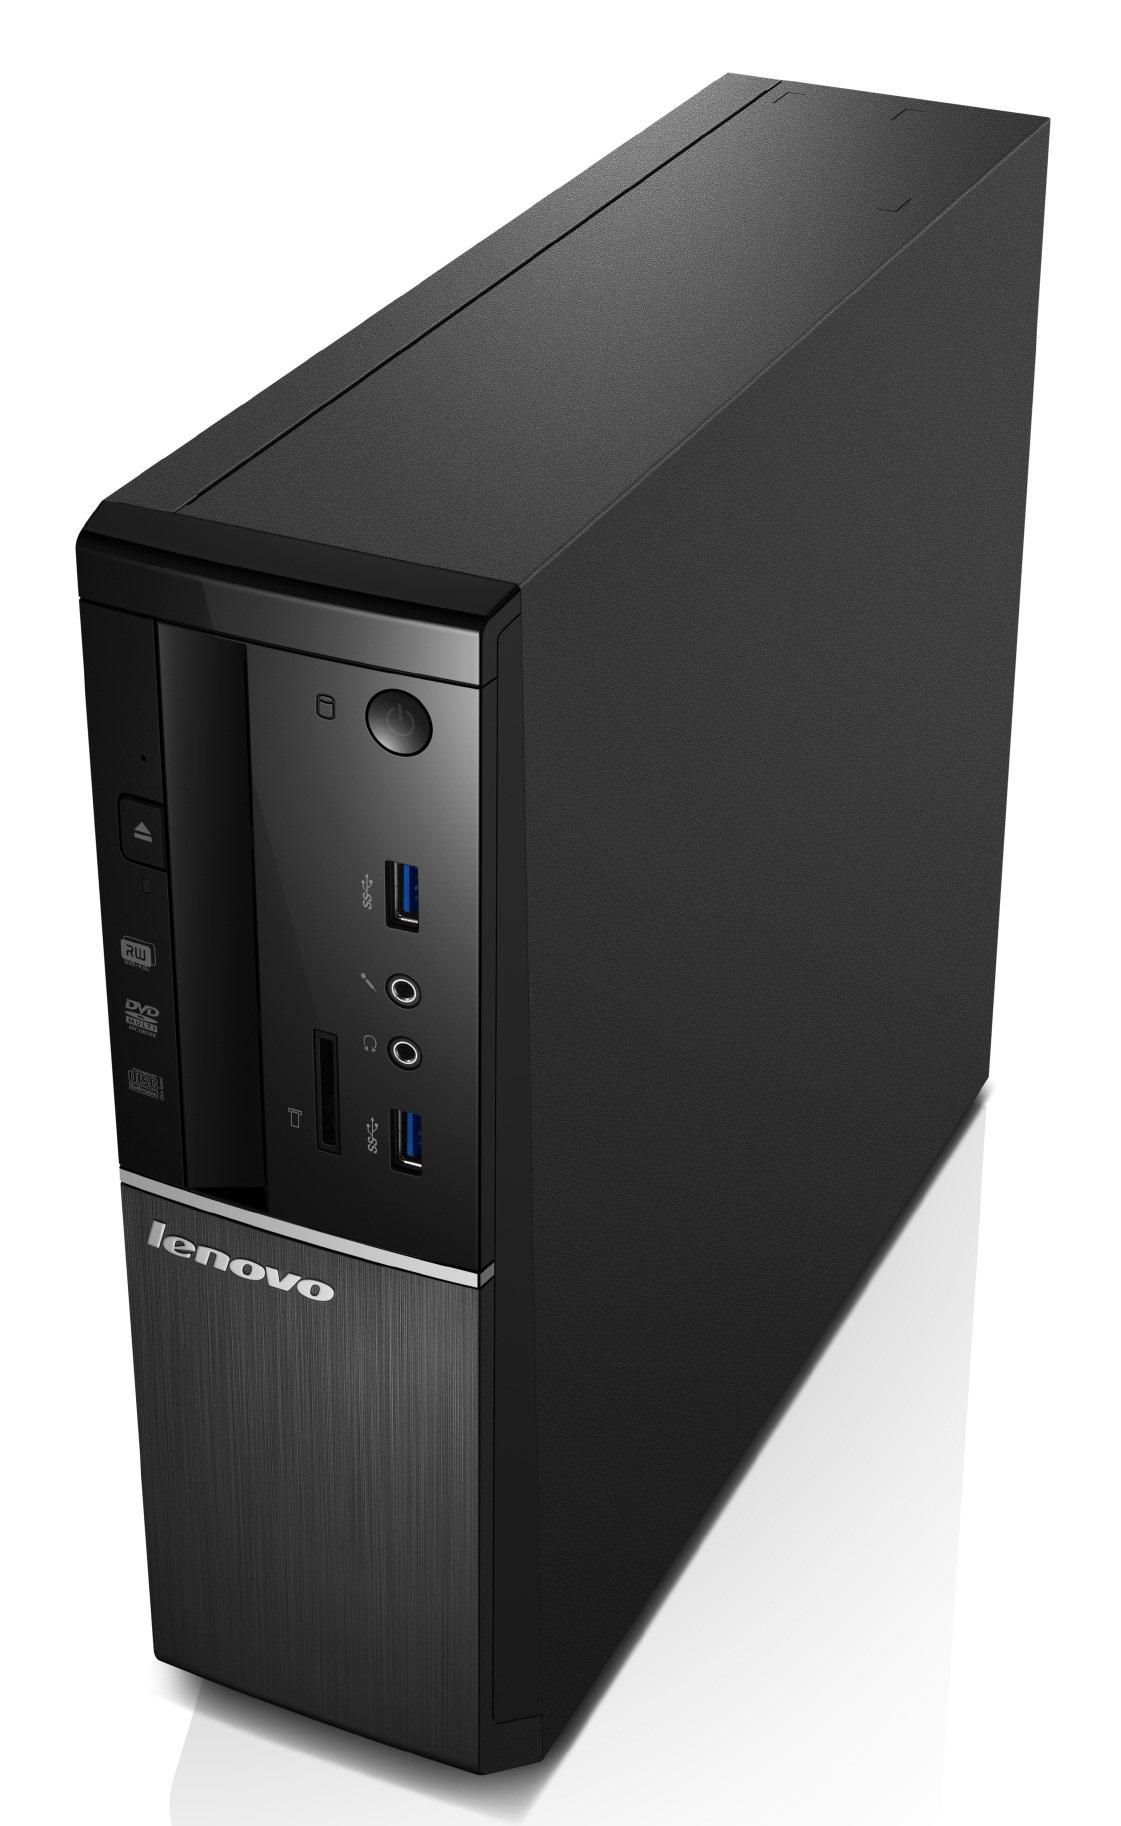 Lenovo IdeaCentre 510S-08IKL i5-7400 3,50GHz/8GB/SSD 128GB + HDD 500GB/GeForce 2GB/DVD-RW/SFF/WIN10 90GB002LCK